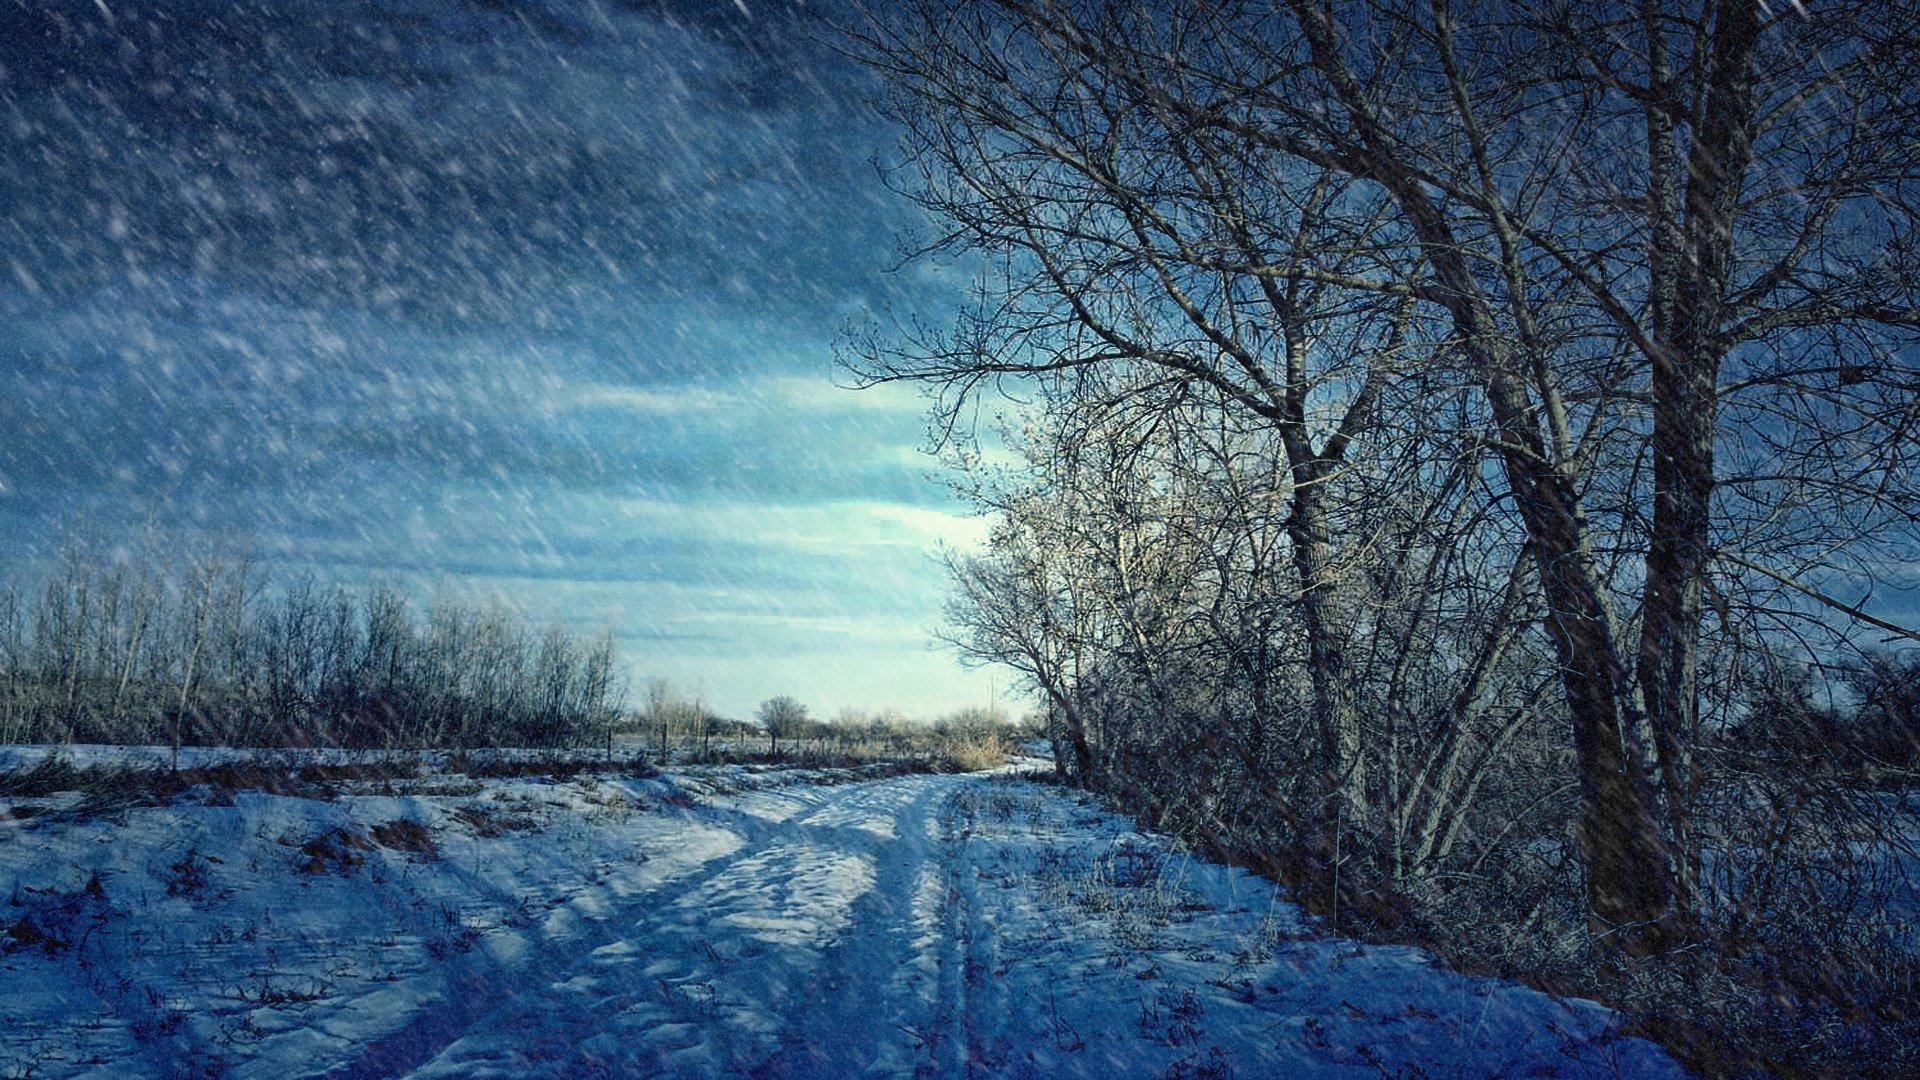 Free Desktop Wallpaper Winter Scene - 45 Winter Scene Modern FHDQ